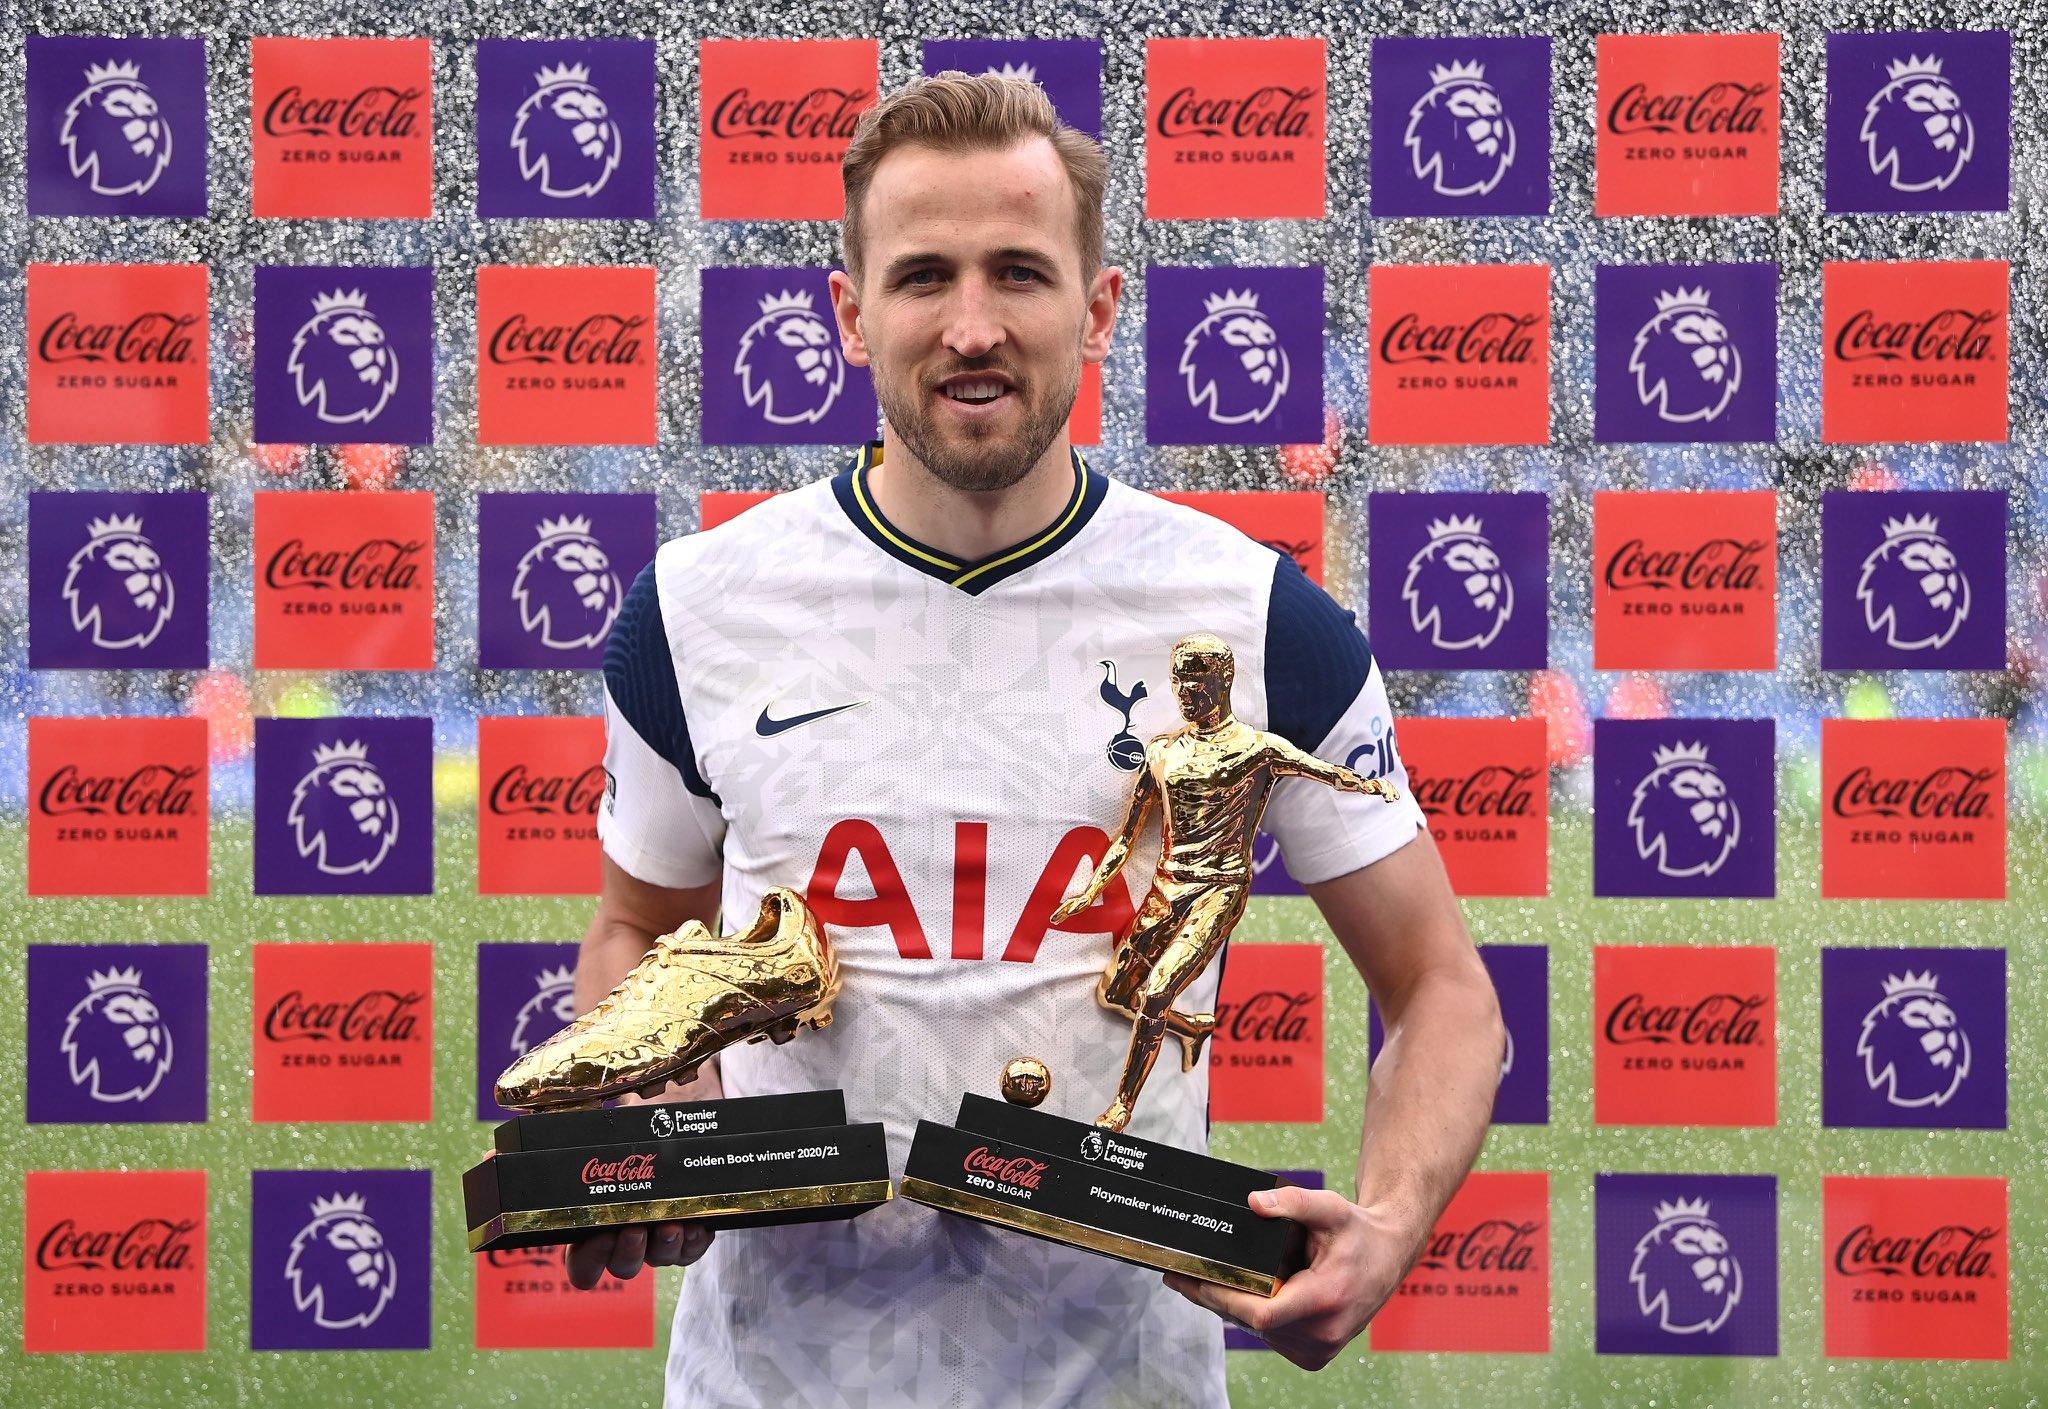 Selain 23 gol, Kane juga menyumbangkan 14 assist untuk Tottenham musim ini.  Foto: Twitter / Liga Inggris